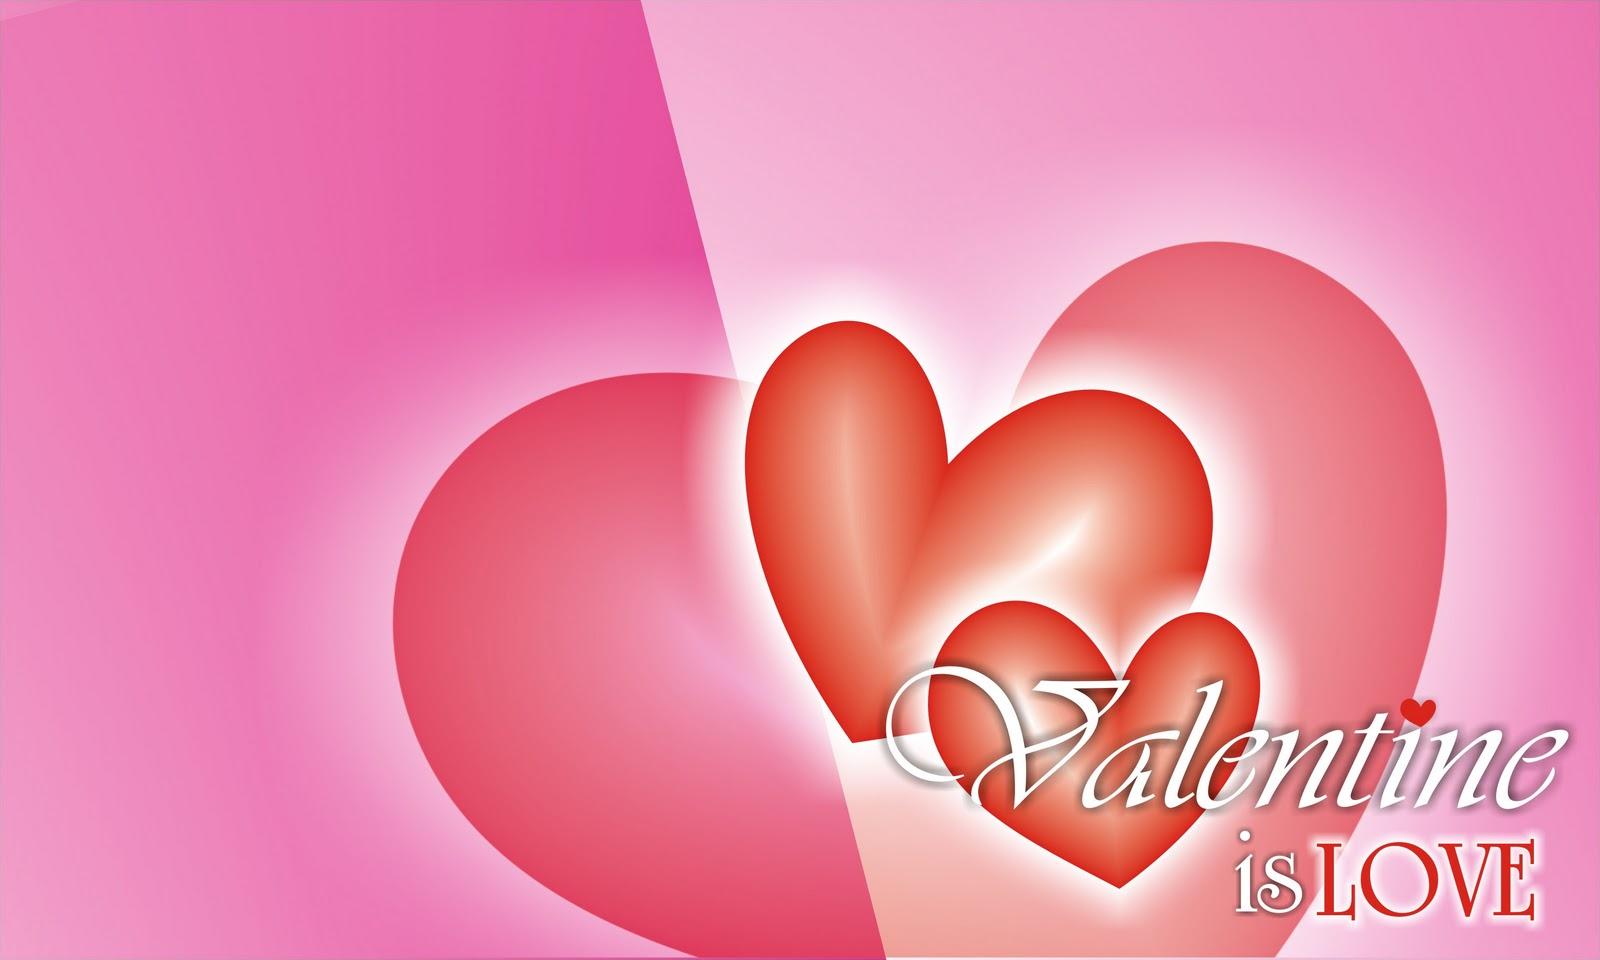 Desktop Wallpaper Valentines Day Backgrounds Romantic